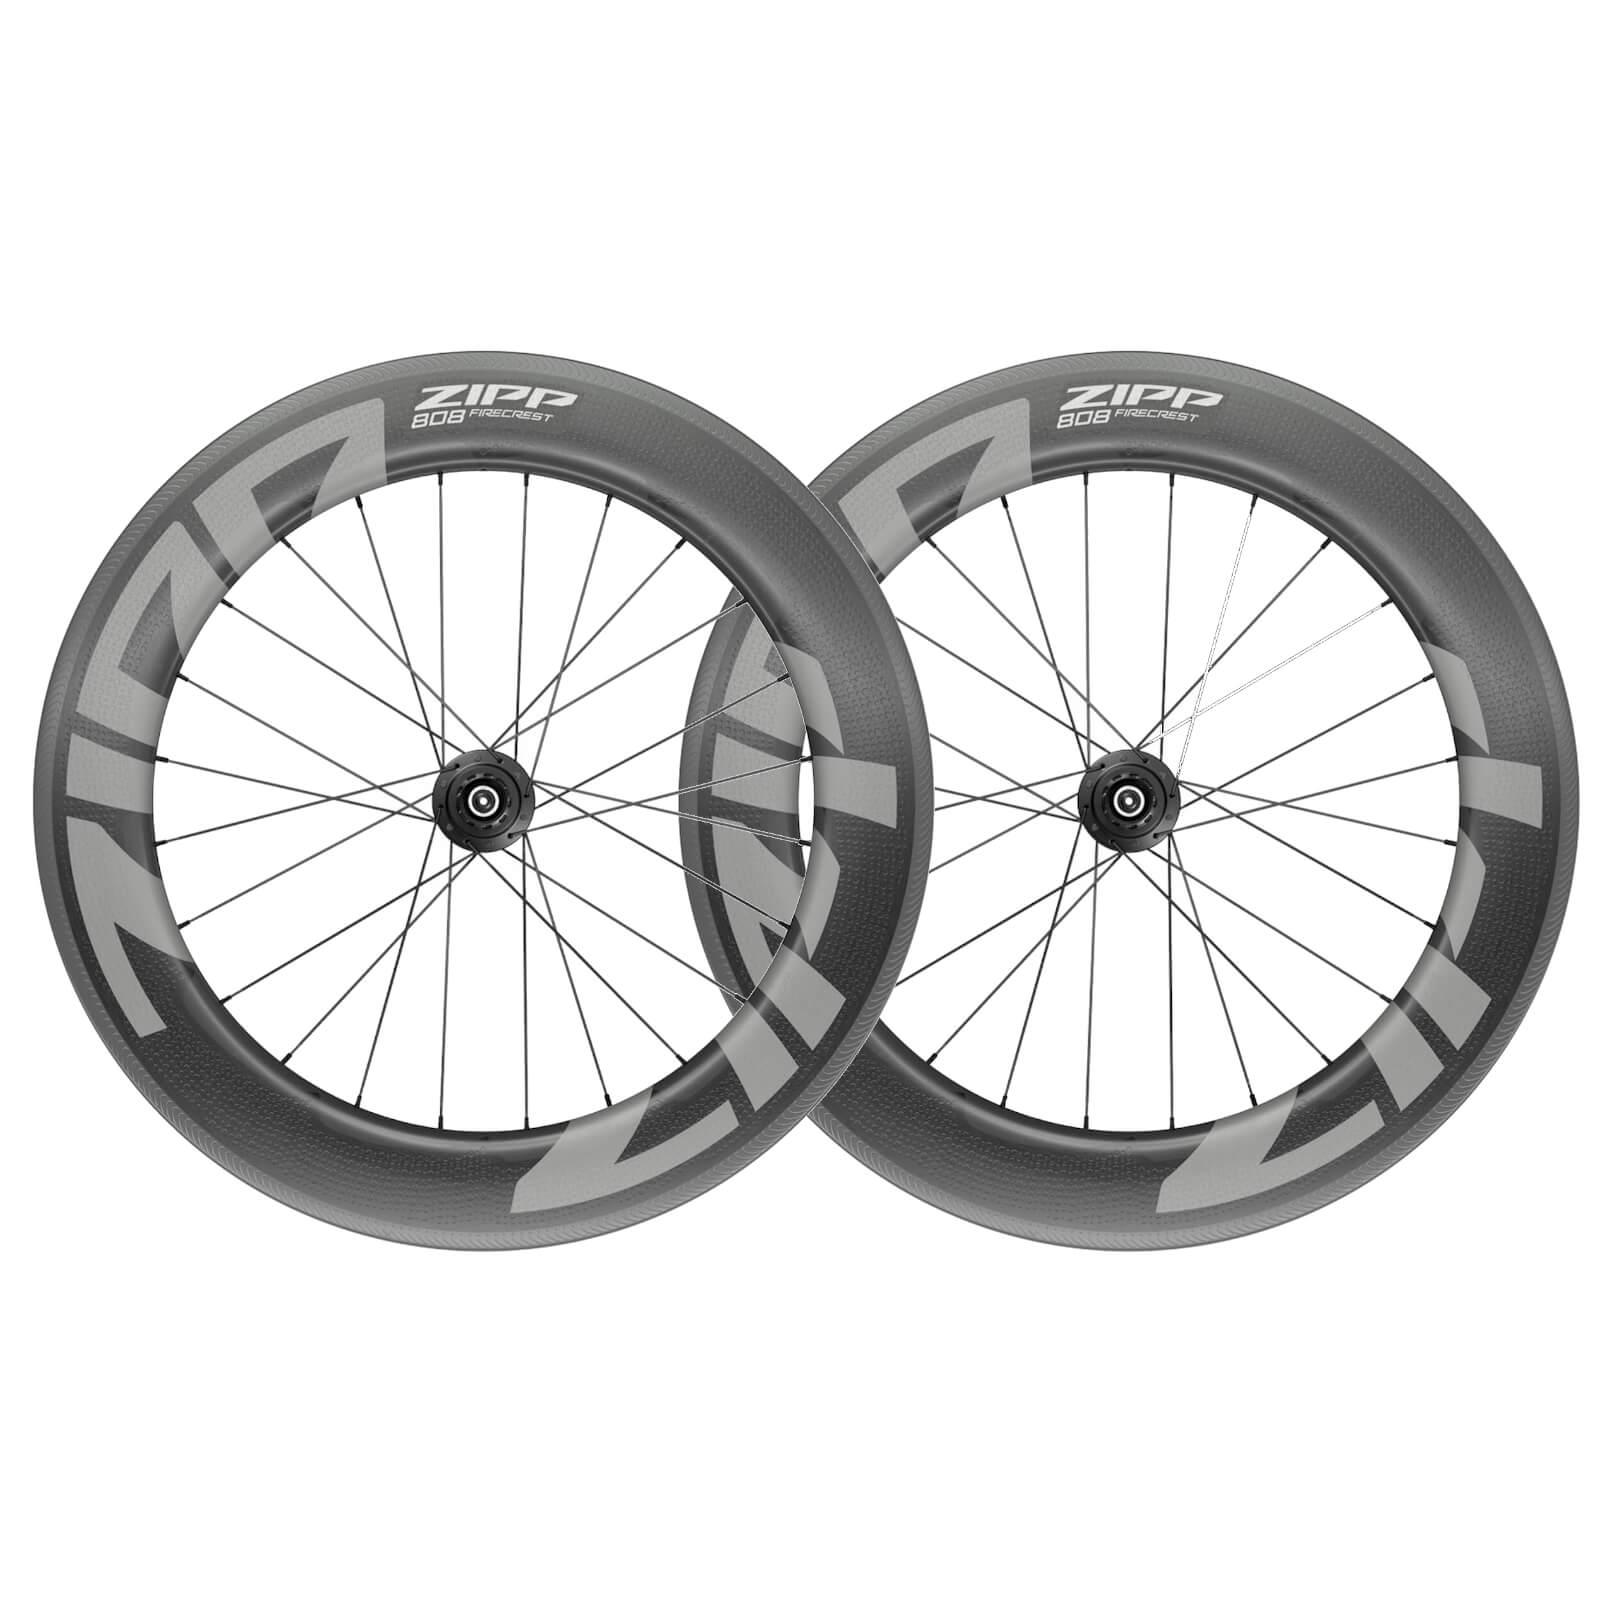 Image of Zipp 808 Firecrest Carbon Clincher Wheelset - Shimano/SRAM